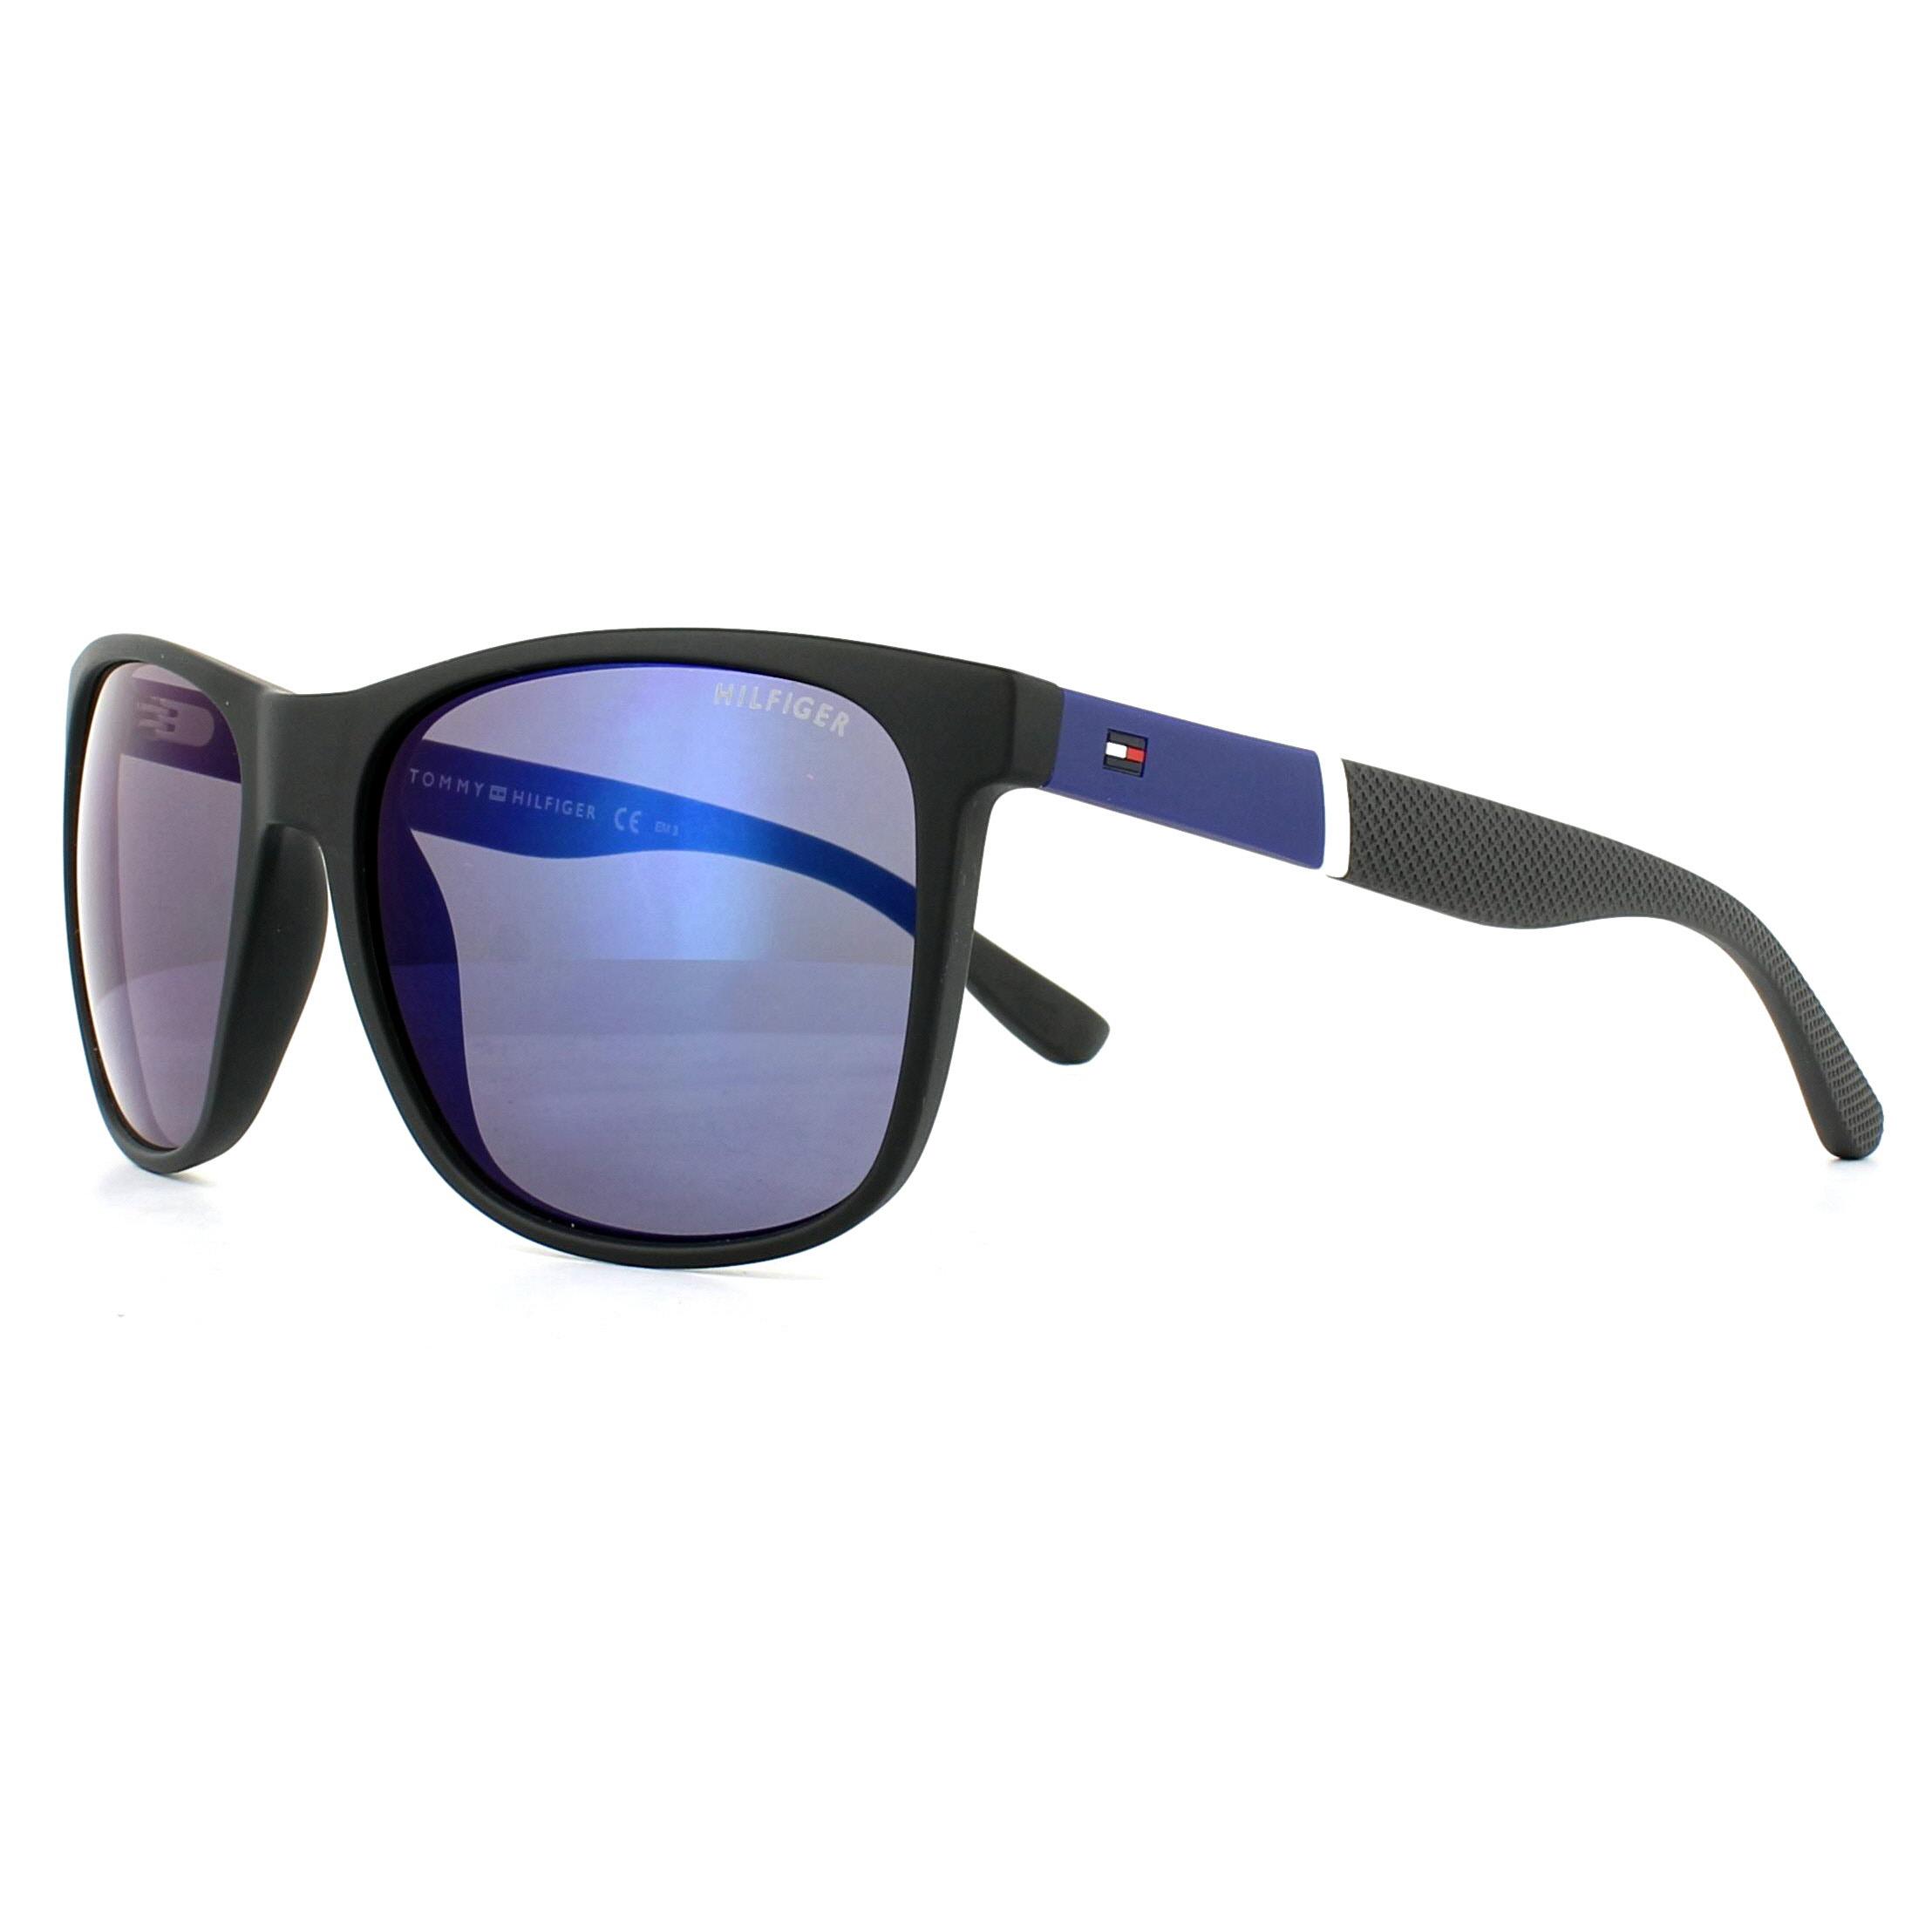 7dc5c41a3e Cheap Tommy Hilfiger TH 1281 S Sunglasses - Discounted Sunglasses